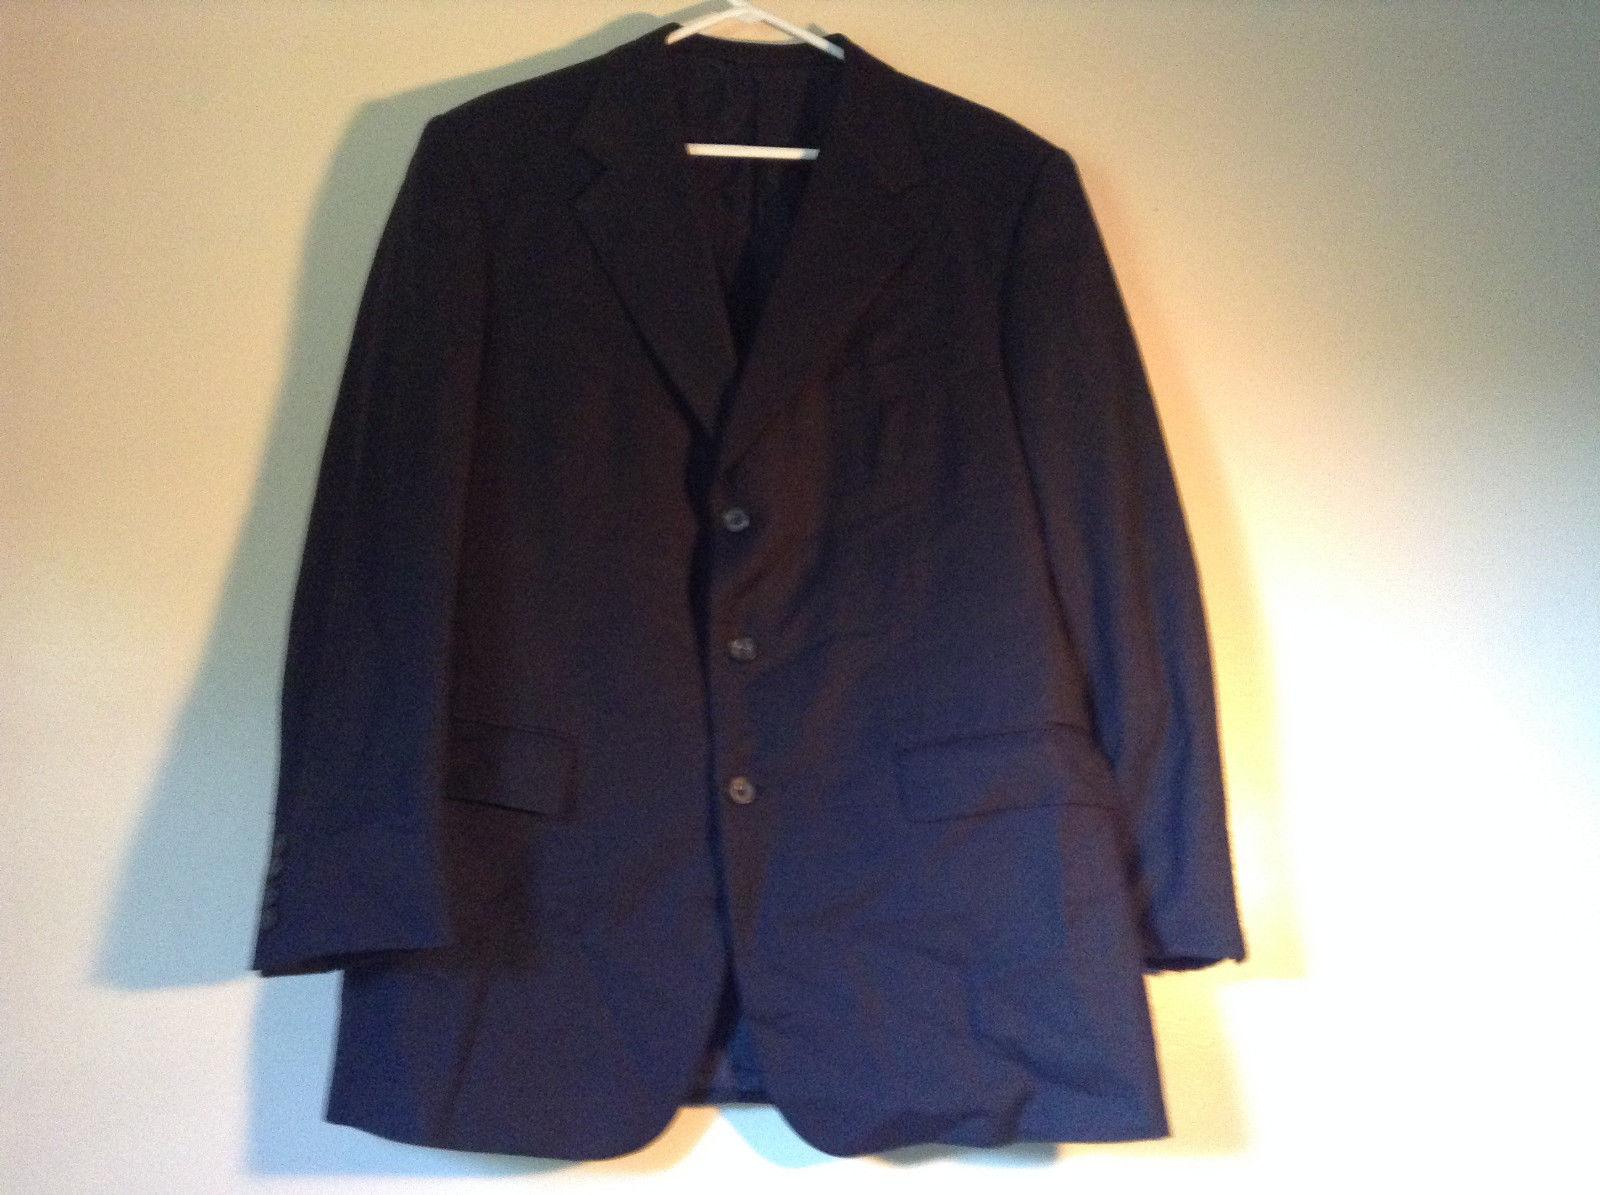 Hilton Very Dark Blue Black Suit Jacket Size 42 Regular 100 Percent Worsted Wool